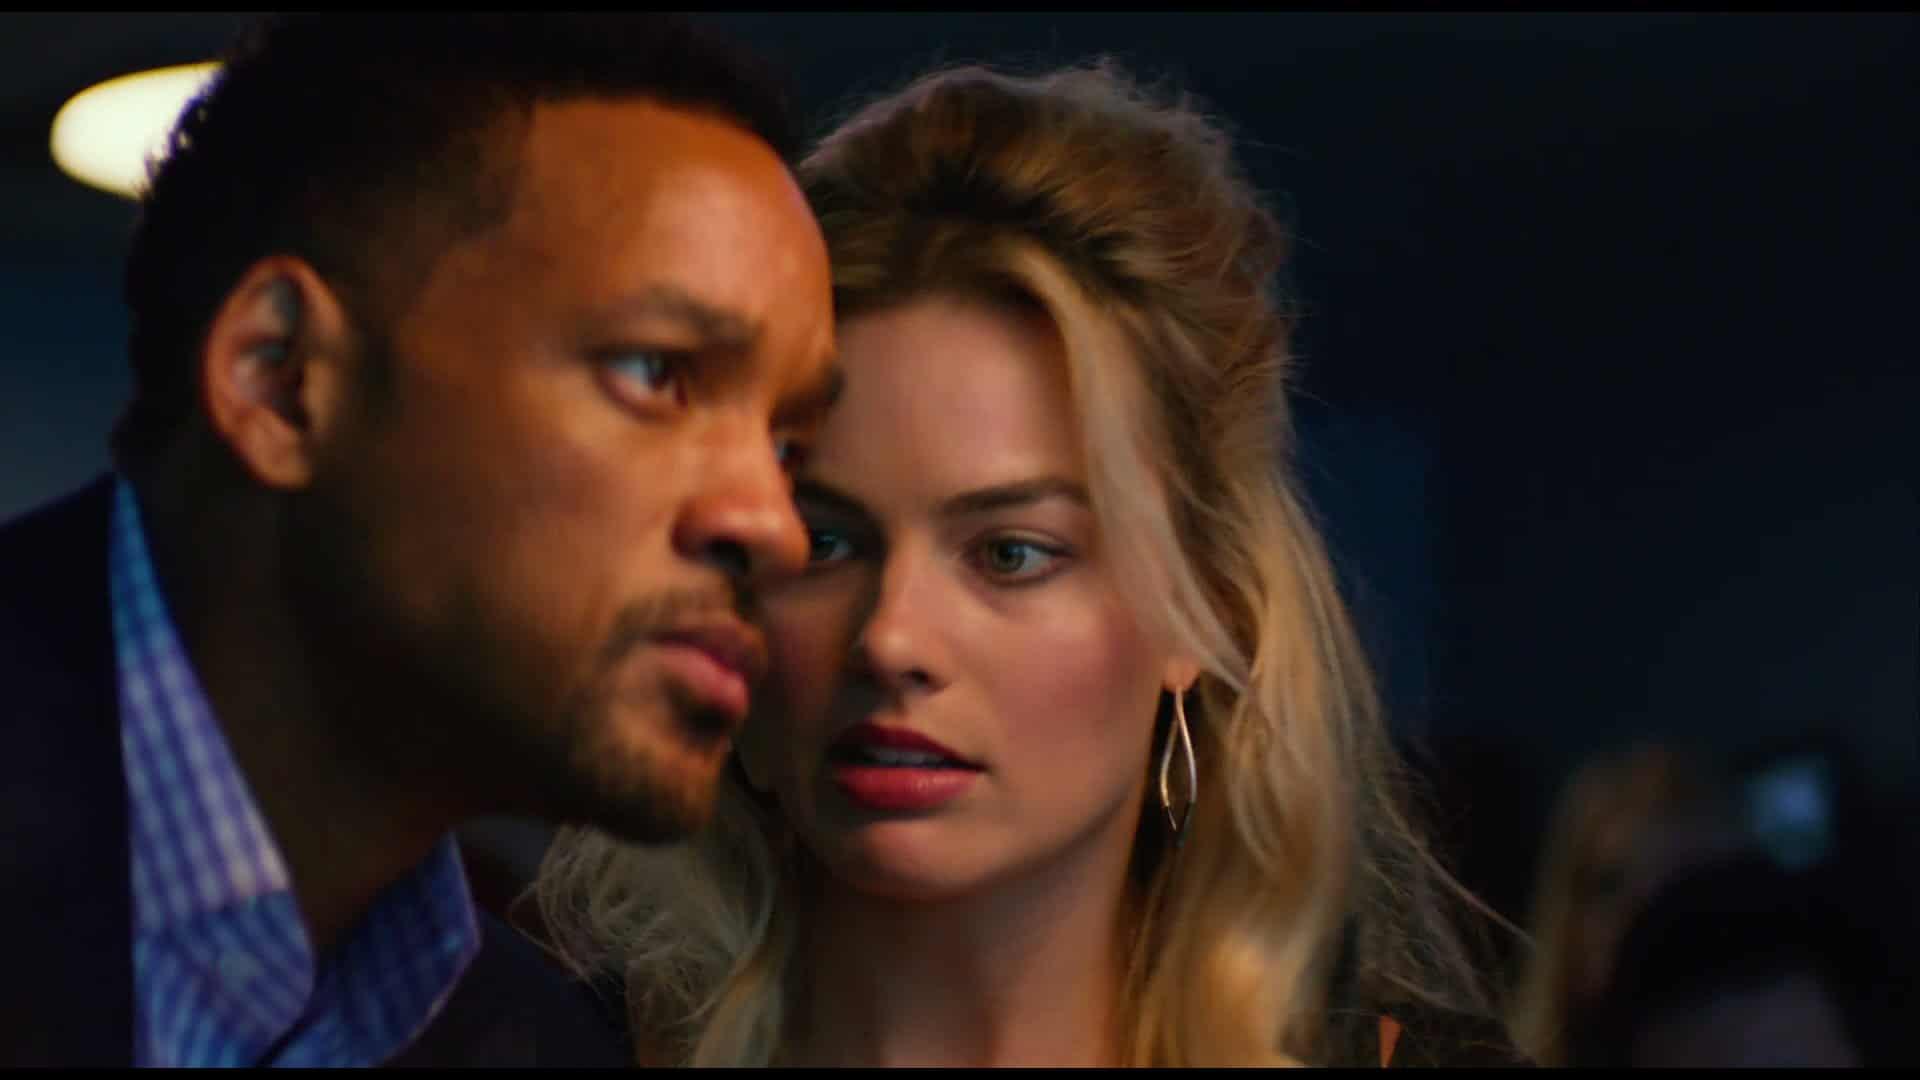 focus-movie-trailer-starring-wil